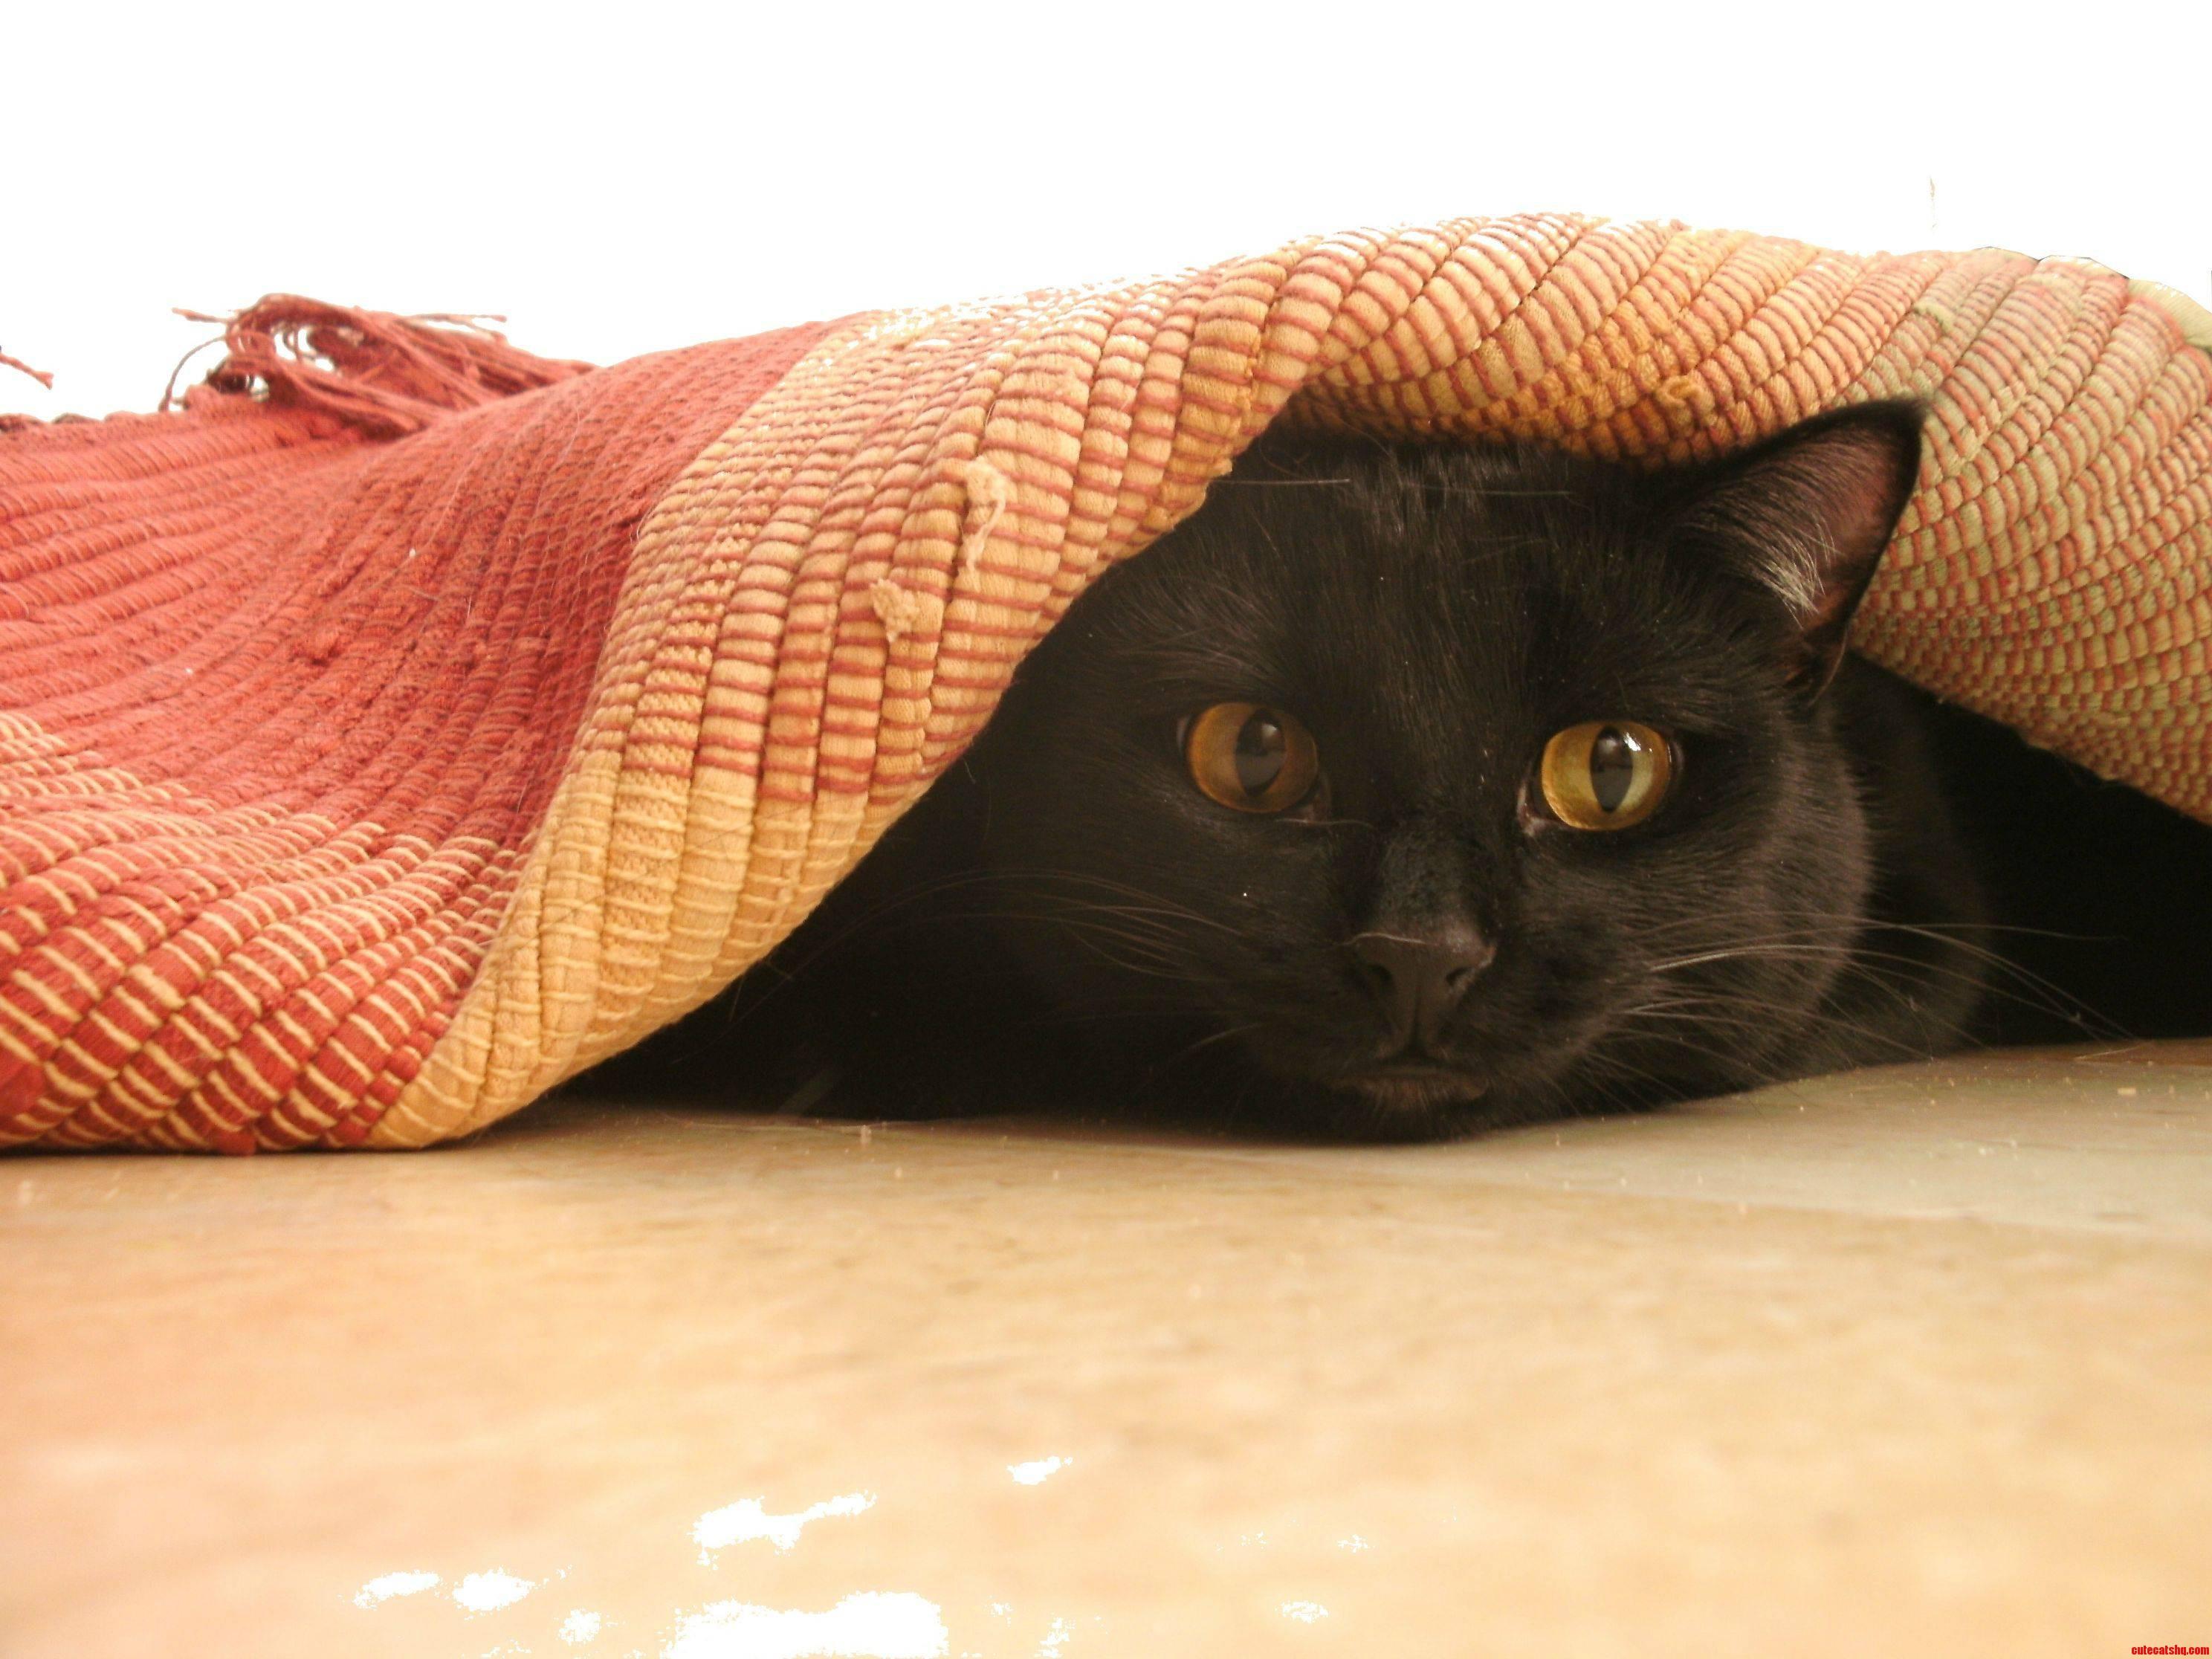 My Exs Cat  Zinfandel. He Always Thought He Was Sneaky Hiding Under Rugs.